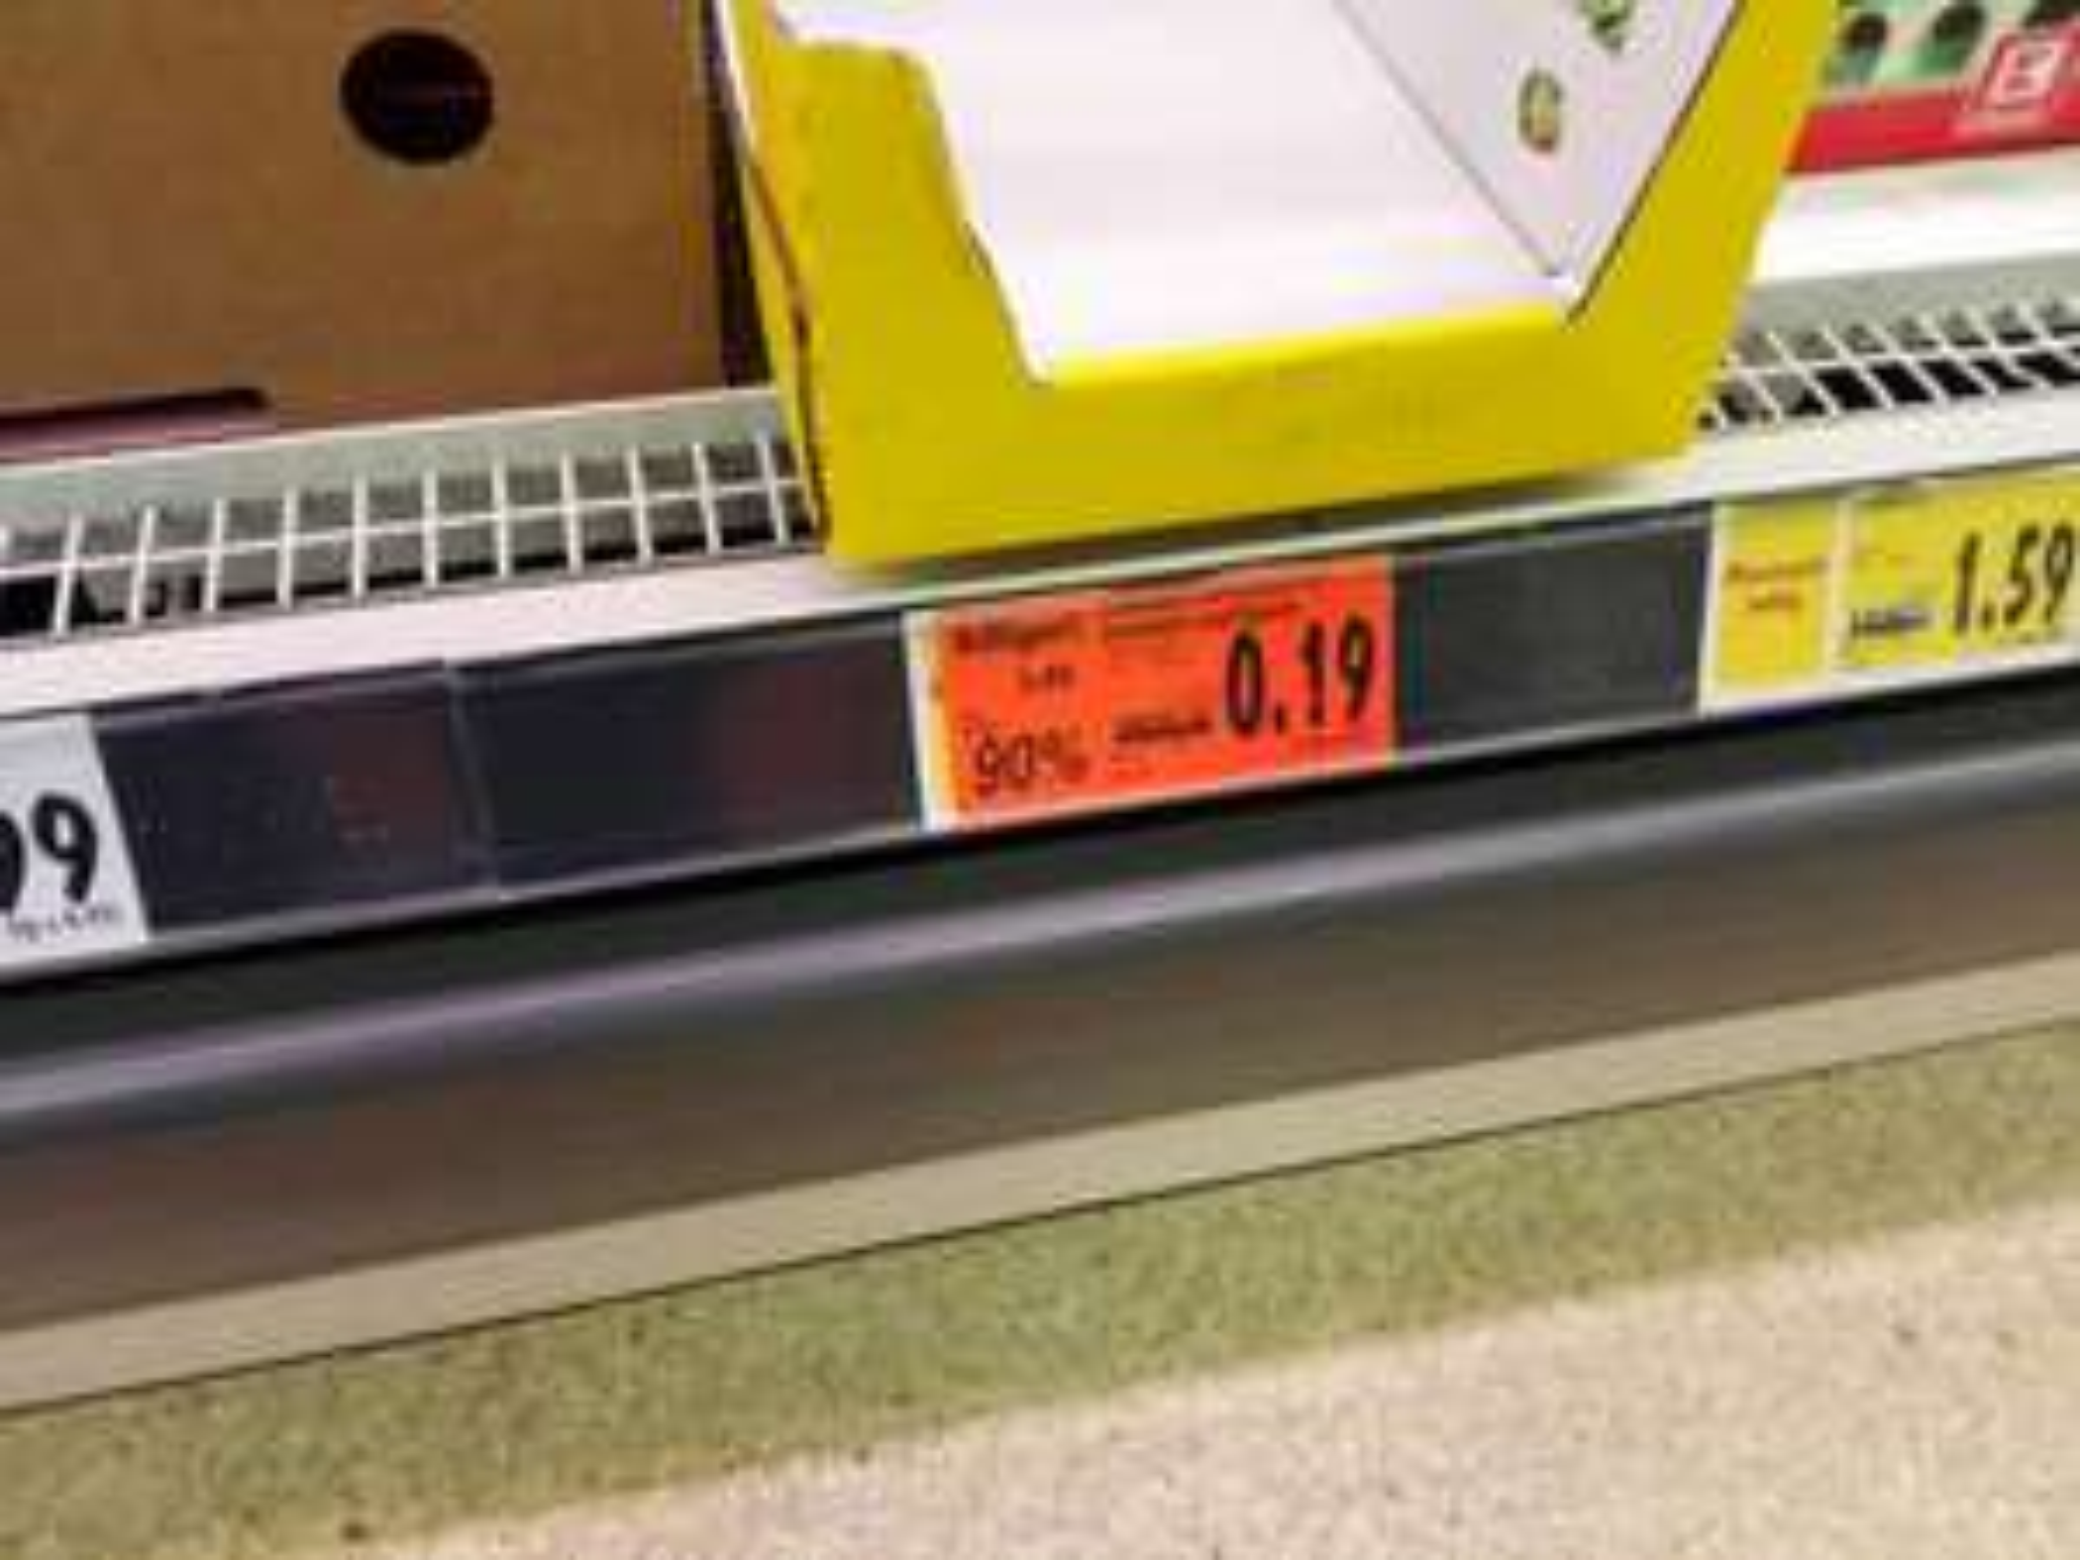 [Lokal Oberhausen] Kaufland Flammkuchen 0,19 Euro - 90%